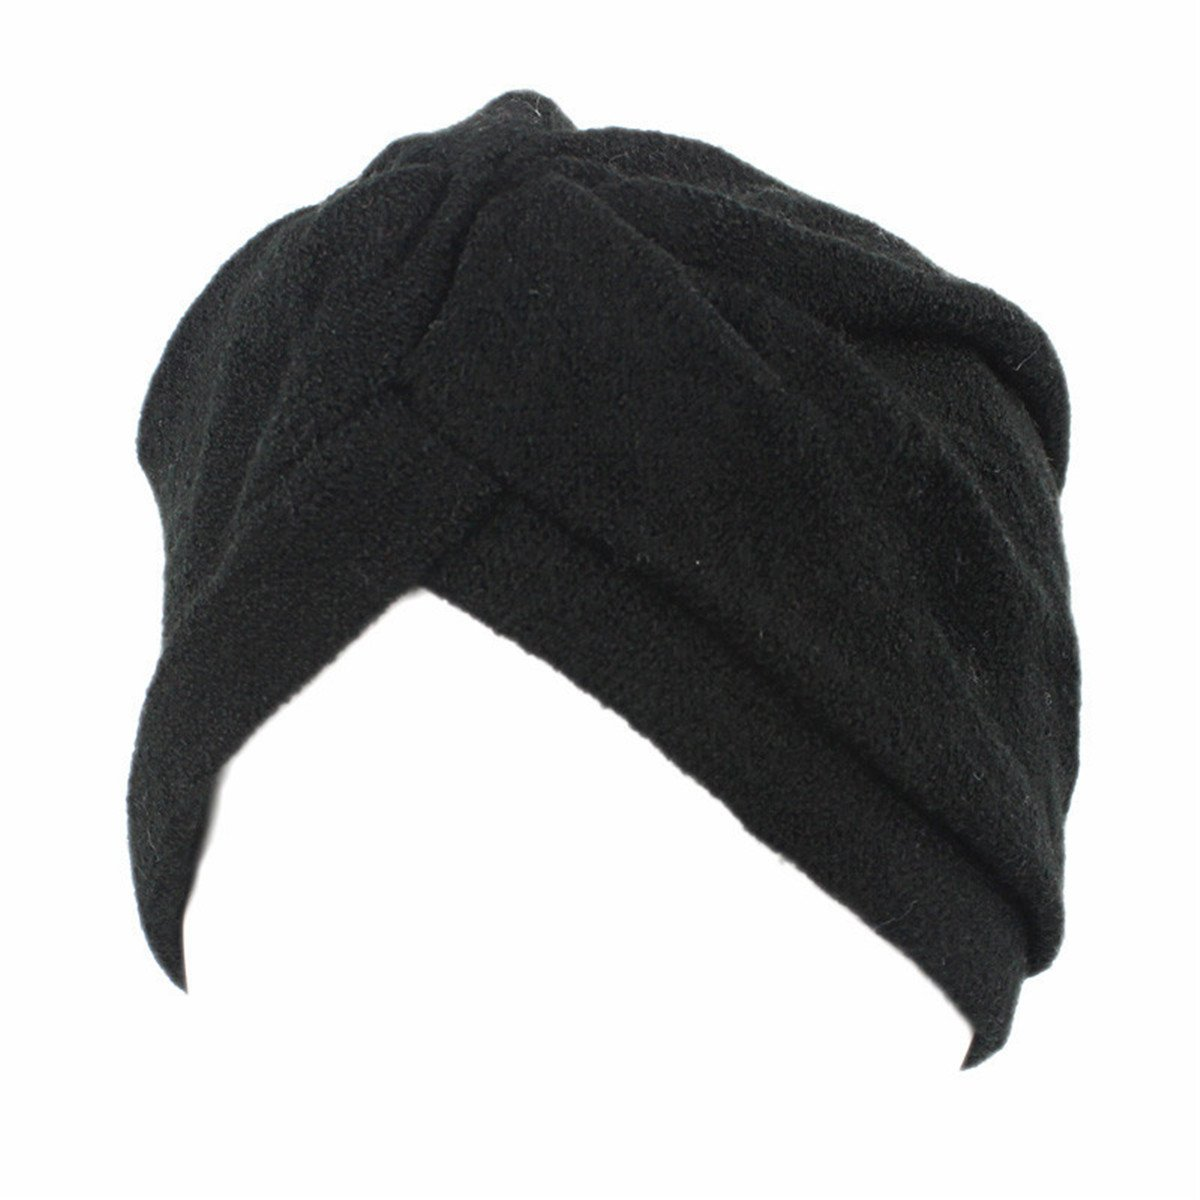 Qhome Wool Blending Jersey Turban hat Winter Indian Cap Lady Hijab Turban  Headband Turbante for Women at Amazon Women s Clothing store  c9c0e2609565